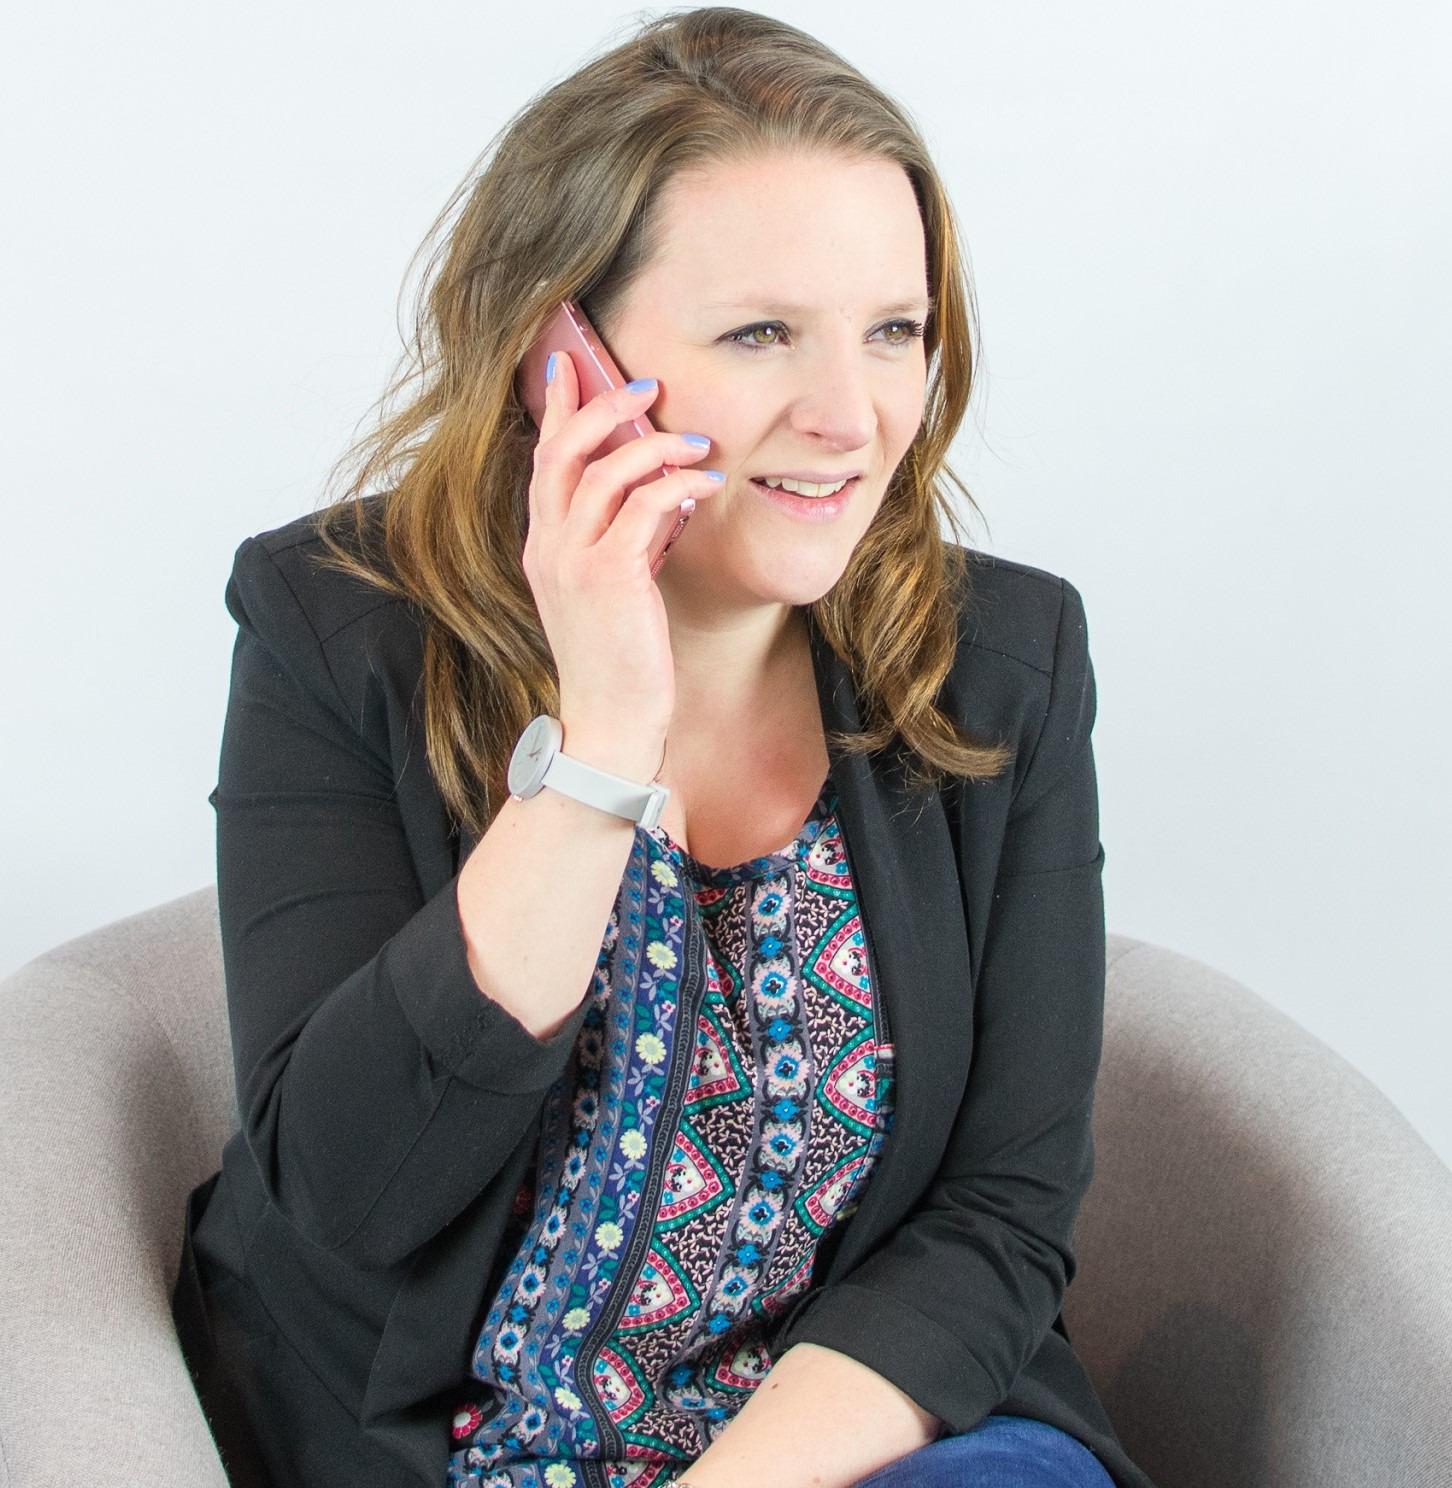 Meet the author - internal comms and copywriter extraordinaire Ellie Buckingham